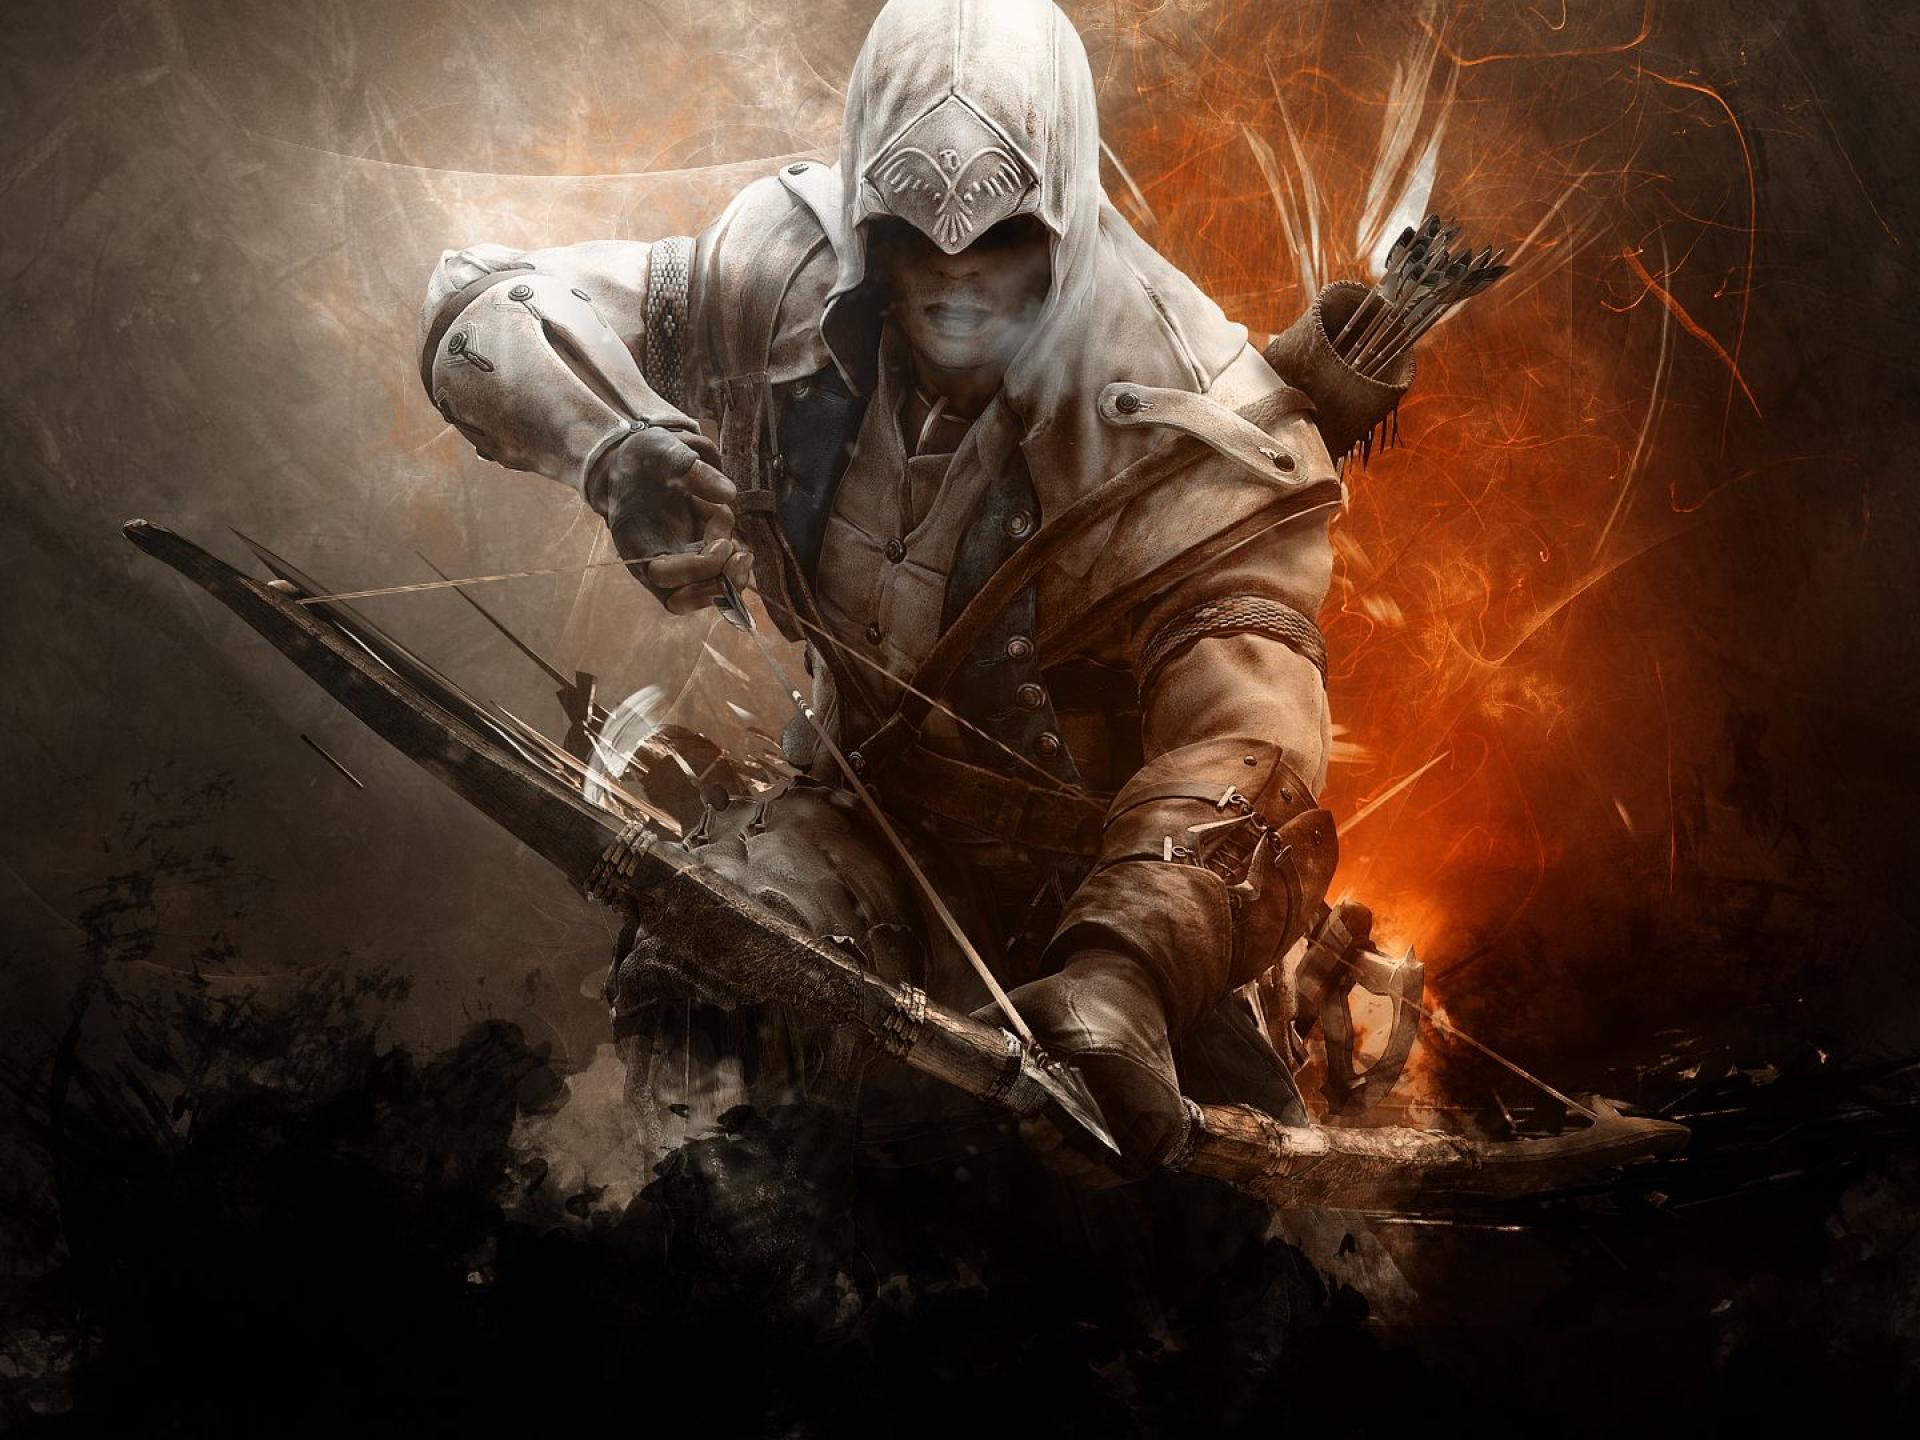 http://www.gamefm.com.br/wp-content/uploads/2012/10/Assassins-Creed-3.jpg